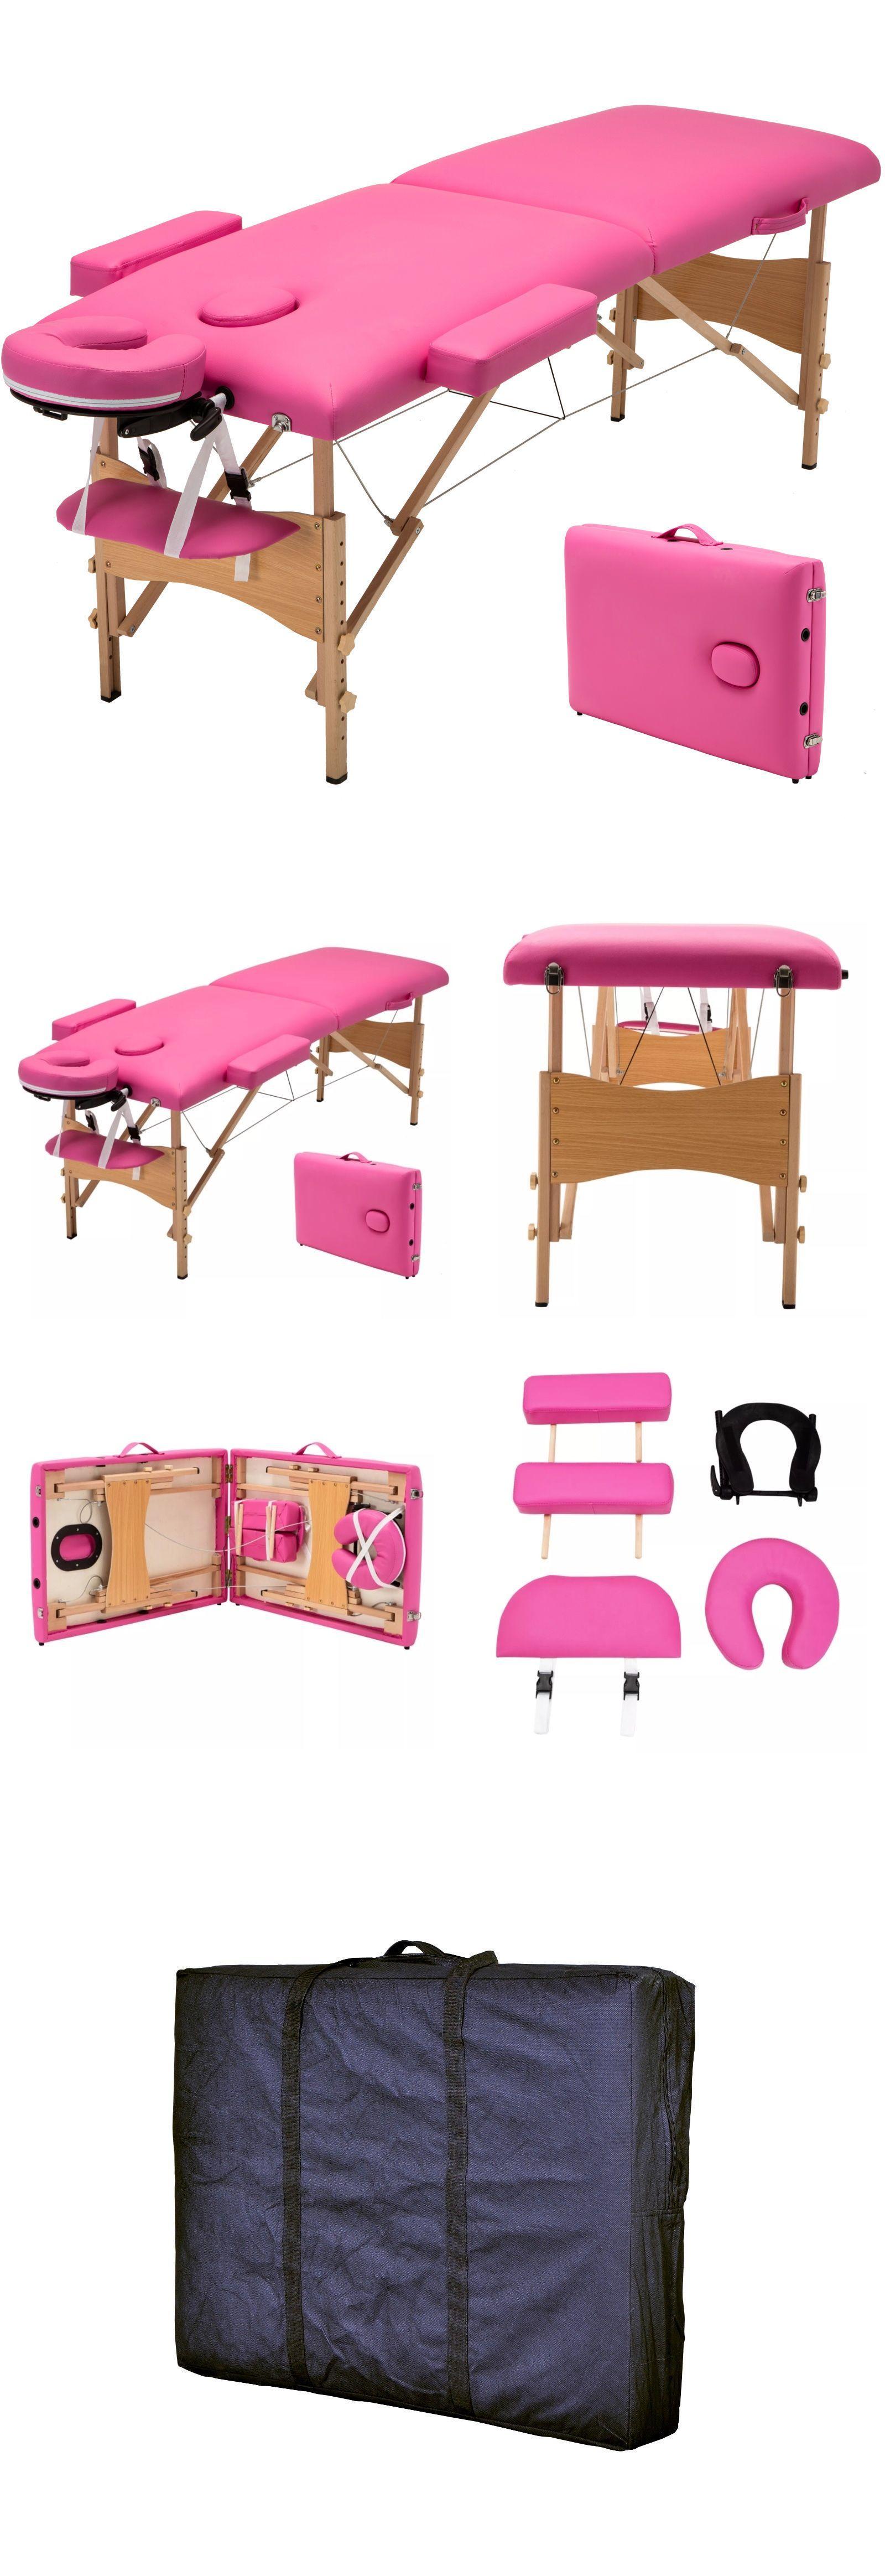 Eyelash Tools New Pink Eyelash Extension Training Bed Kit